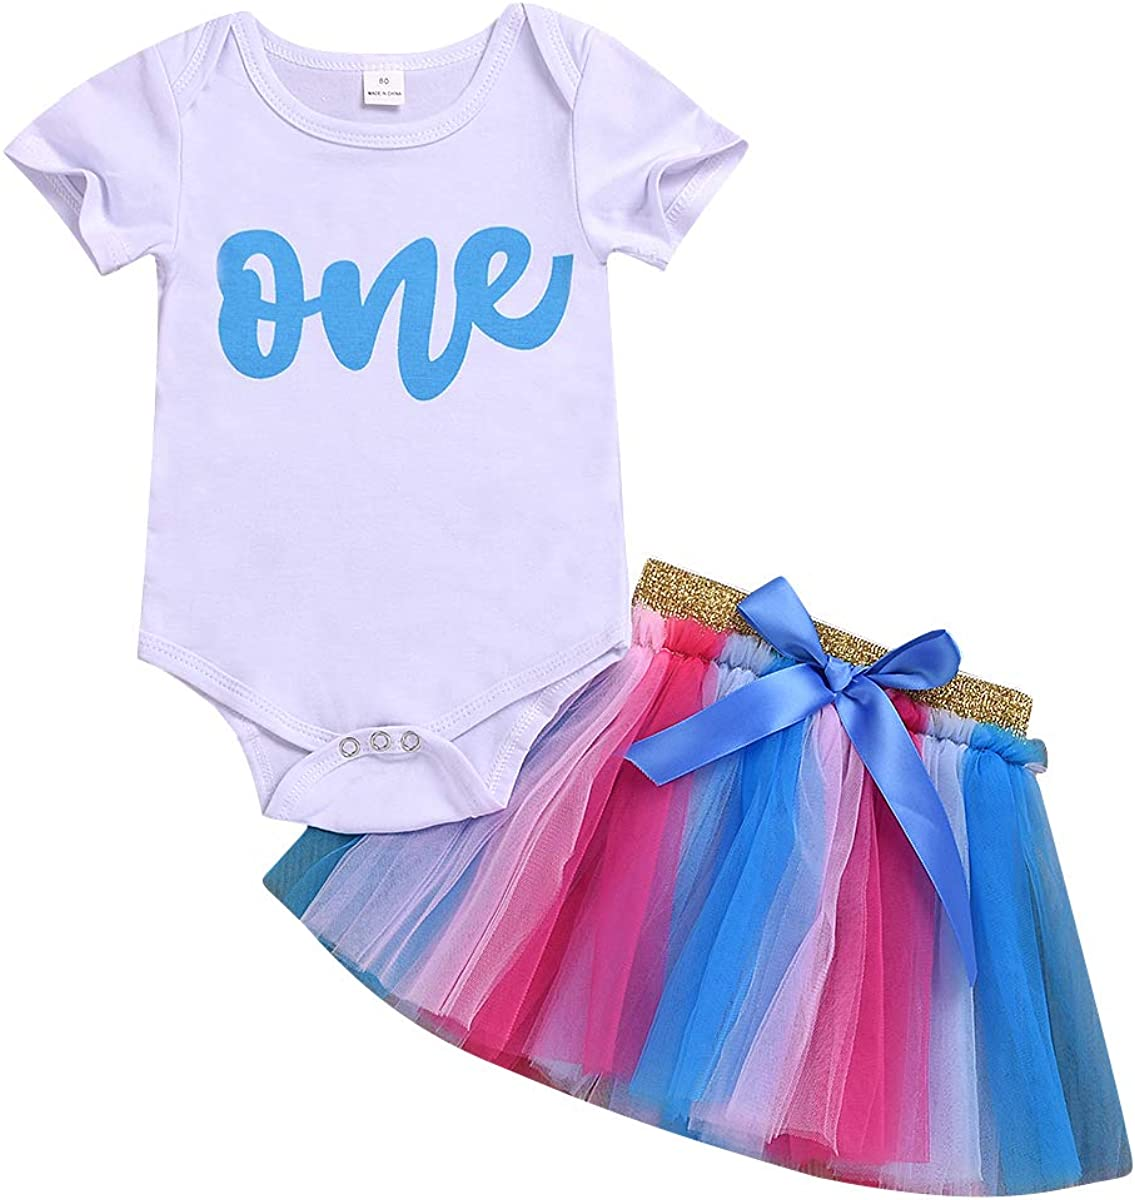 Kislio Infant Baby Girls 1st Birthday Romper Tutu Skirt Chiffon Tutu Dress Outfit Clothes